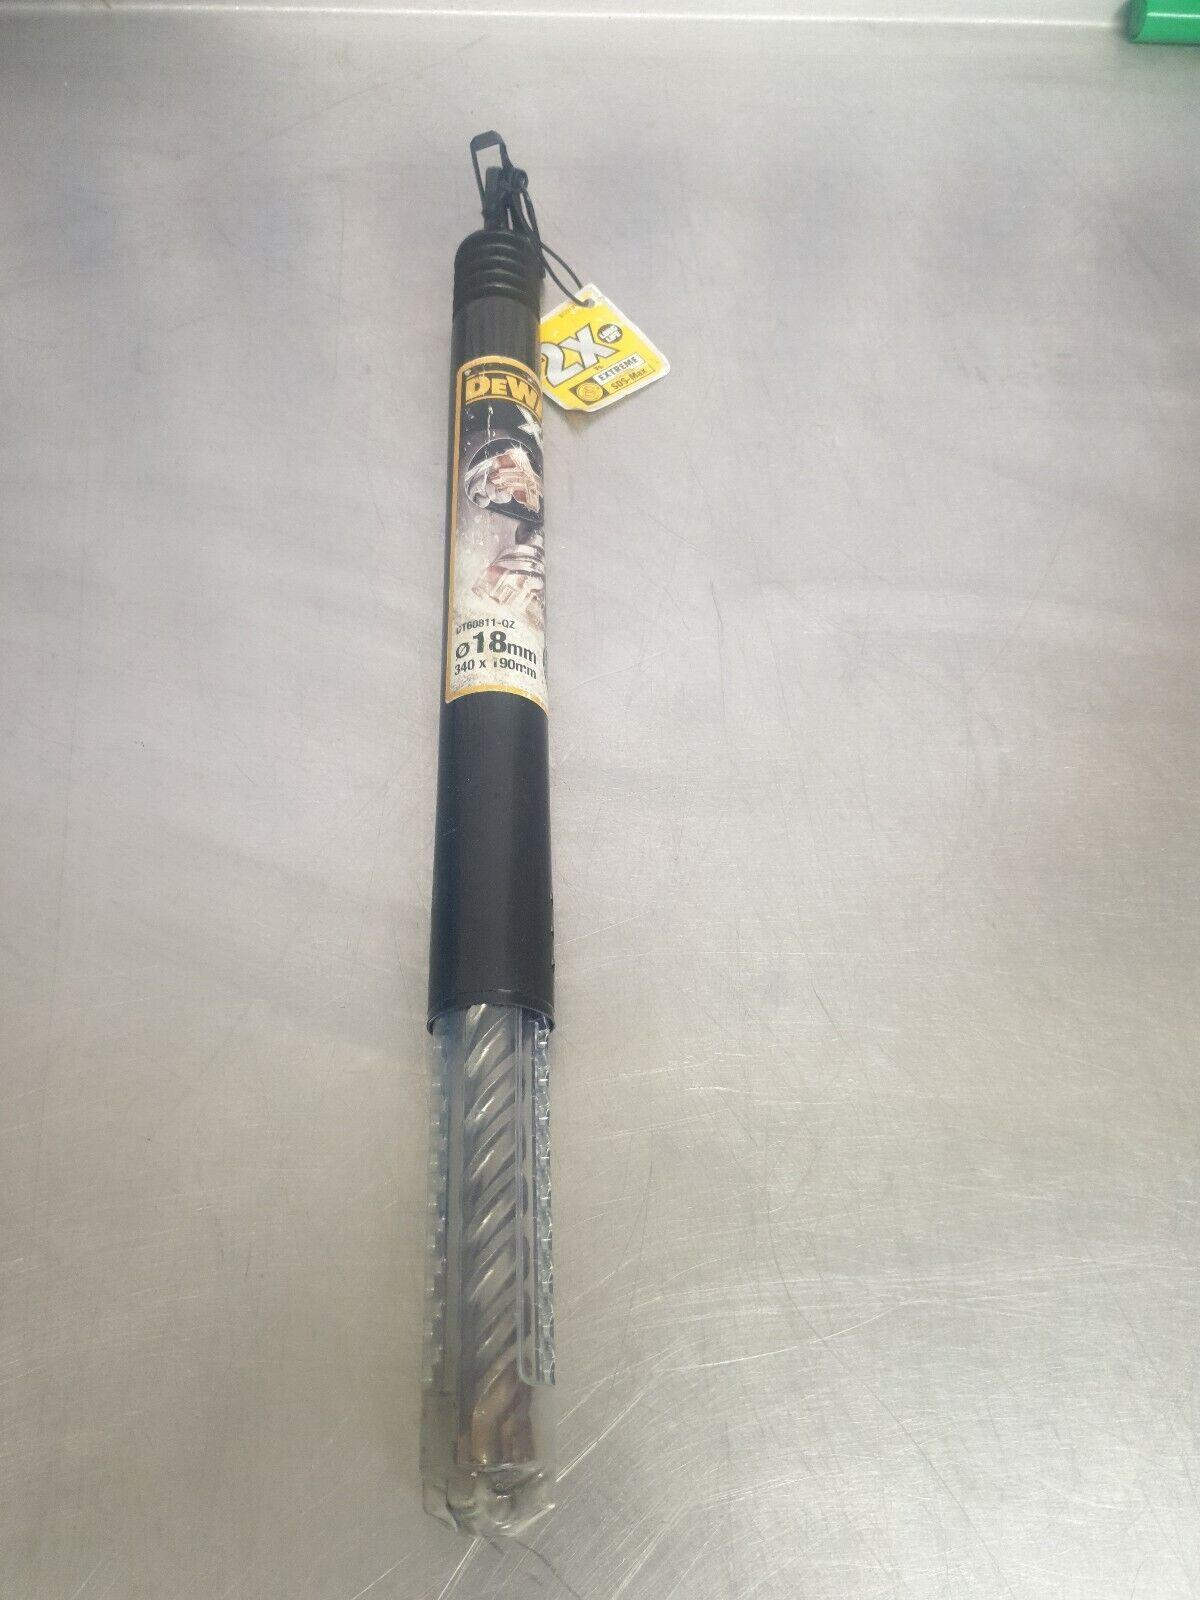 DeWalt XLR 4 Cutter Head SDS Drill Bit 8mm 210mm Pack of 1 DT8924